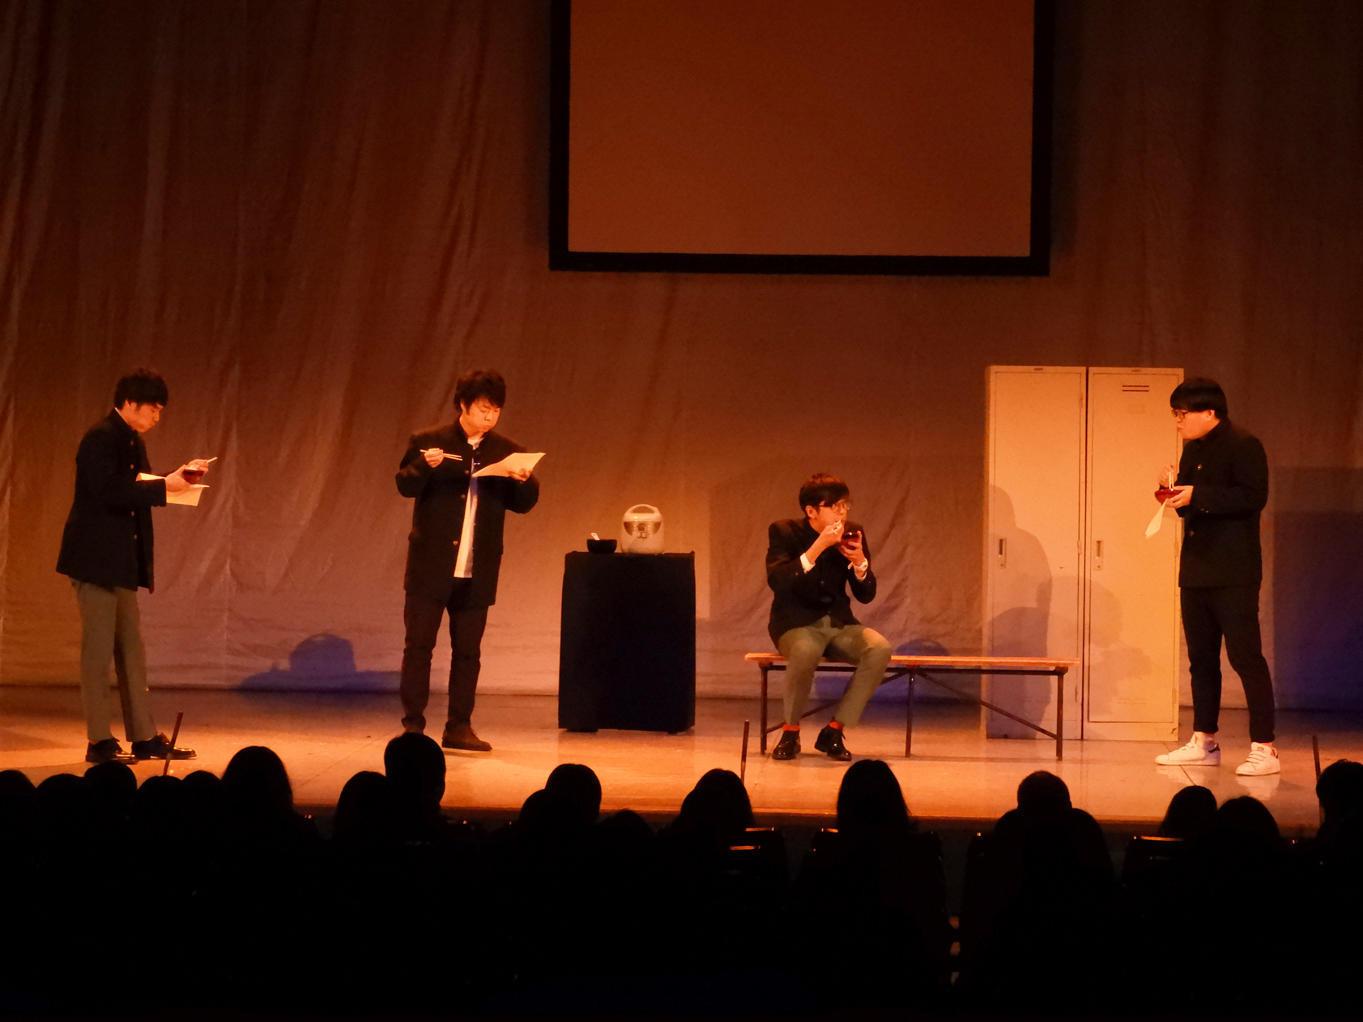 http://news.yoshimoto.co.jp/20180204153651-50f6d17f45fb464e95f1d66c85e463627492ce8a.jpg